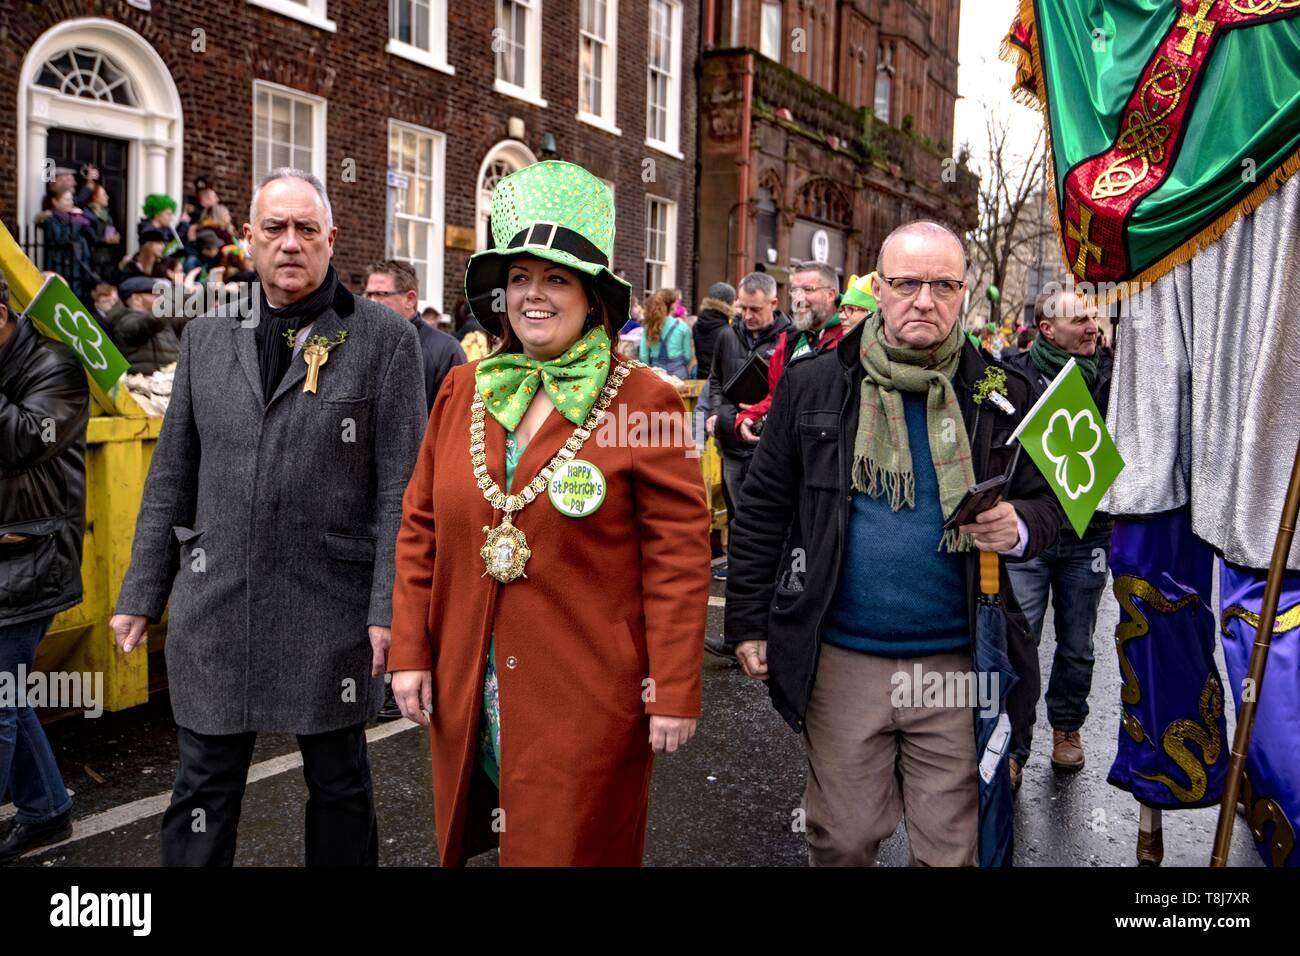 United Kingdom, Northern Ireland, St Patrick's day, Sinn Féin mayor of Belfast Deirdre Hargey - Stock Image